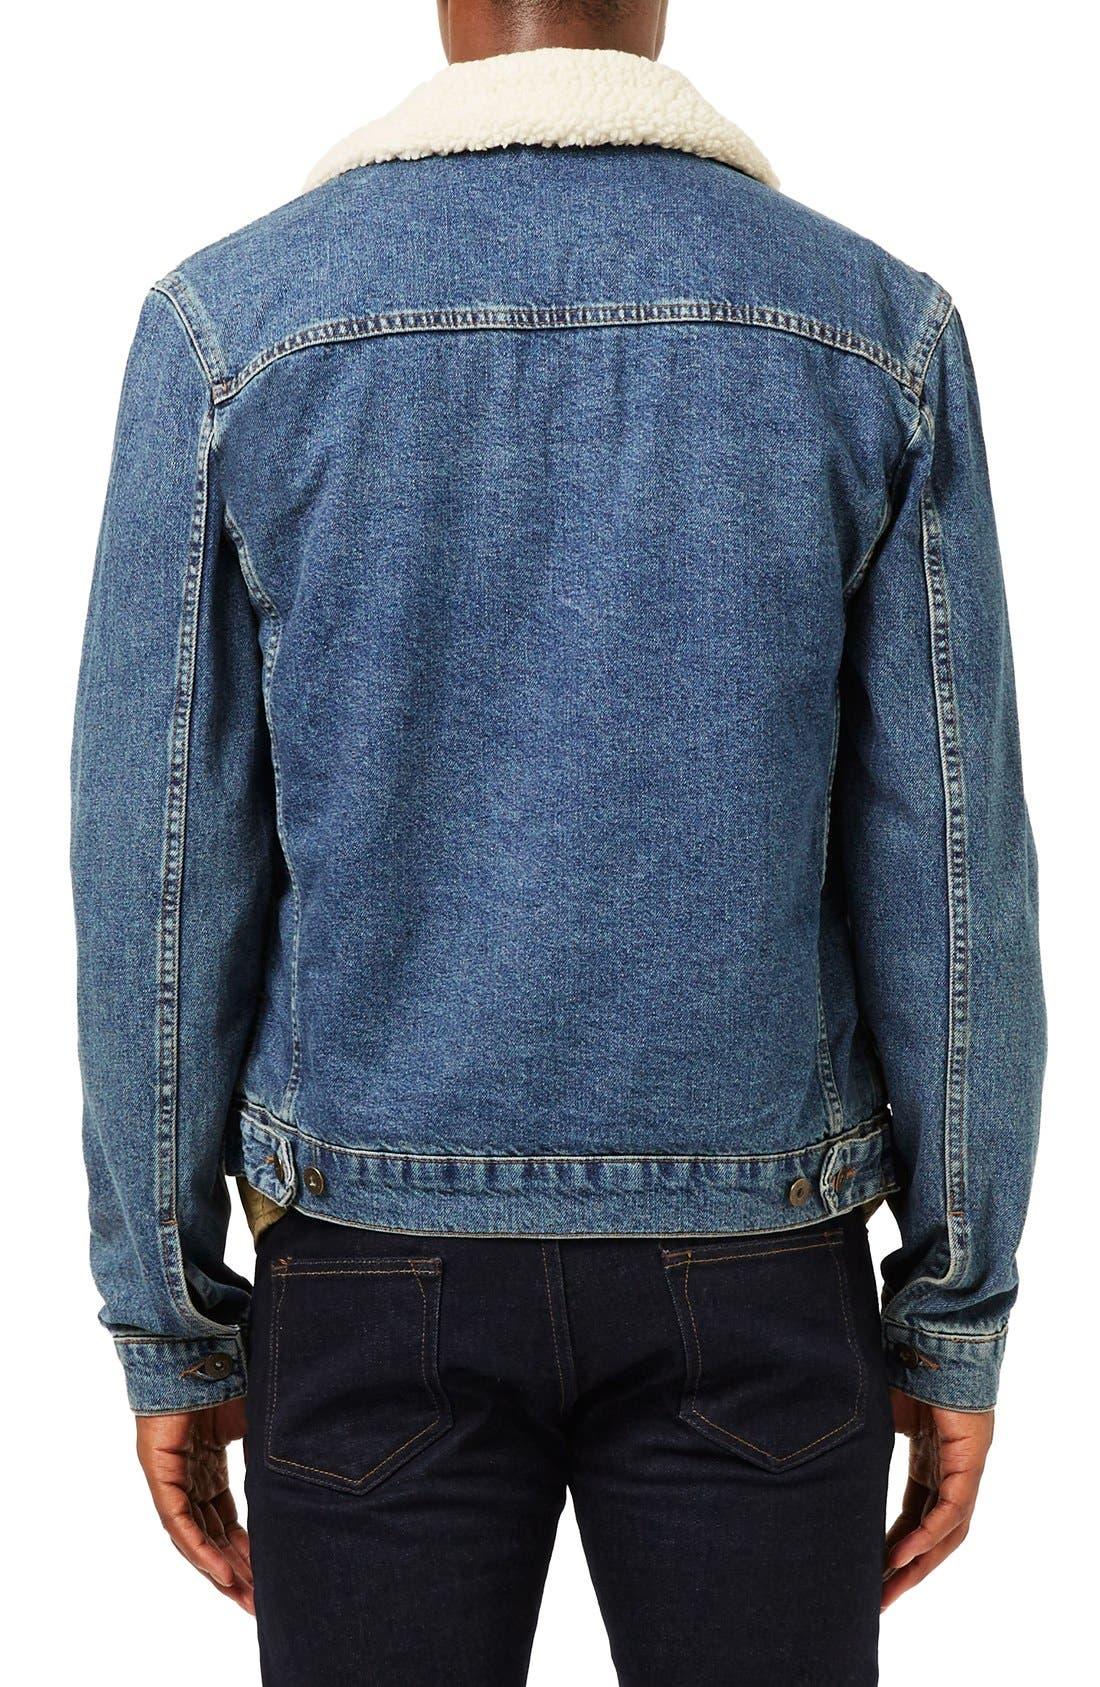 Borg Denim Jacket,                             Alternate thumbnail 3, color,                             Blue